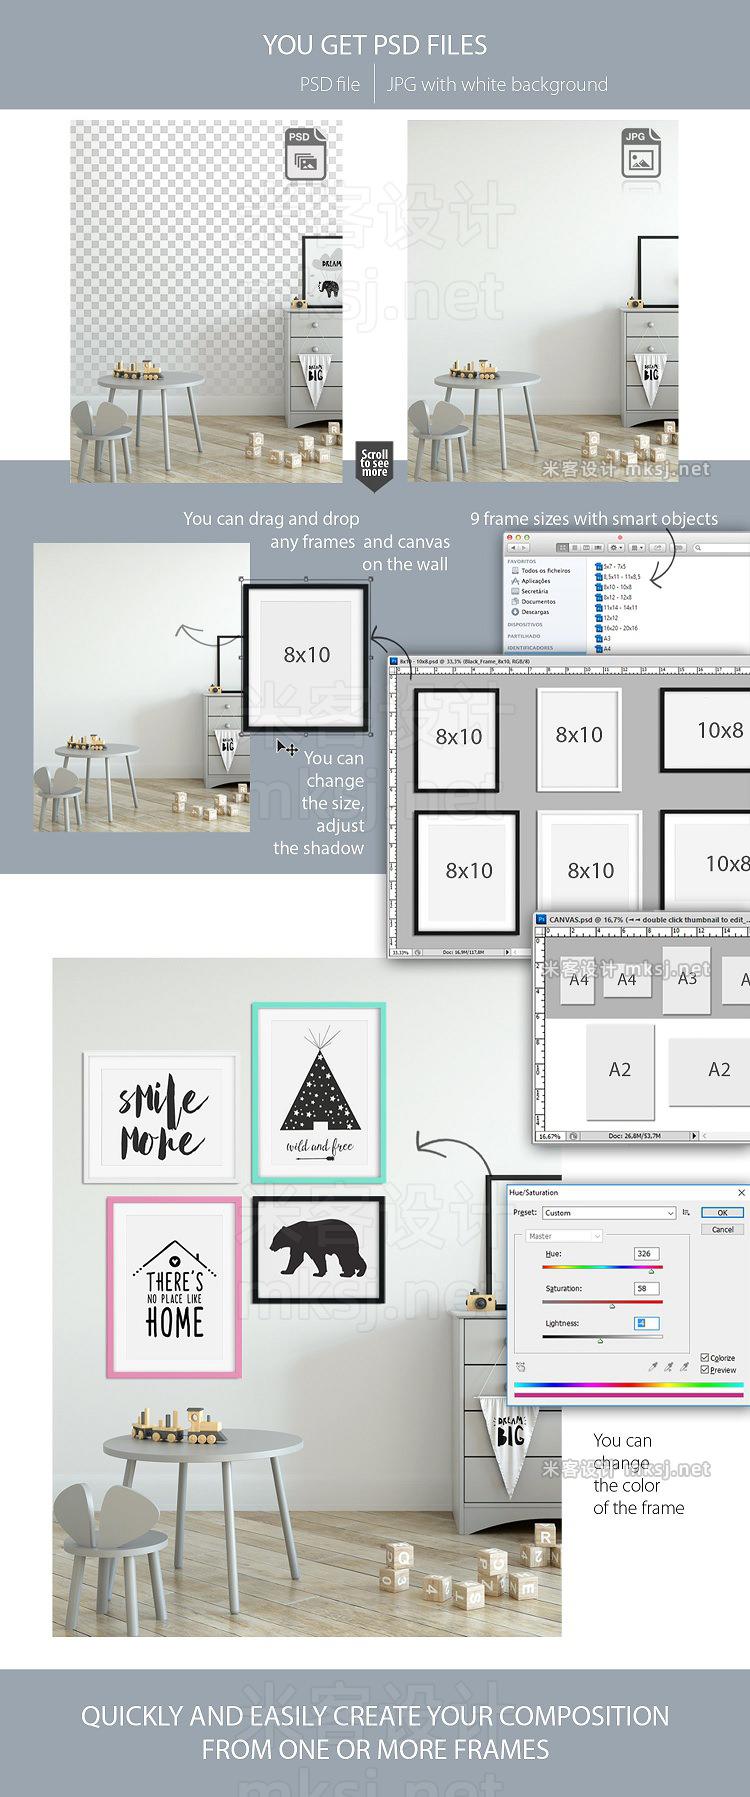 VI贴图 儿童房墙壁相框PS样机mockup模型